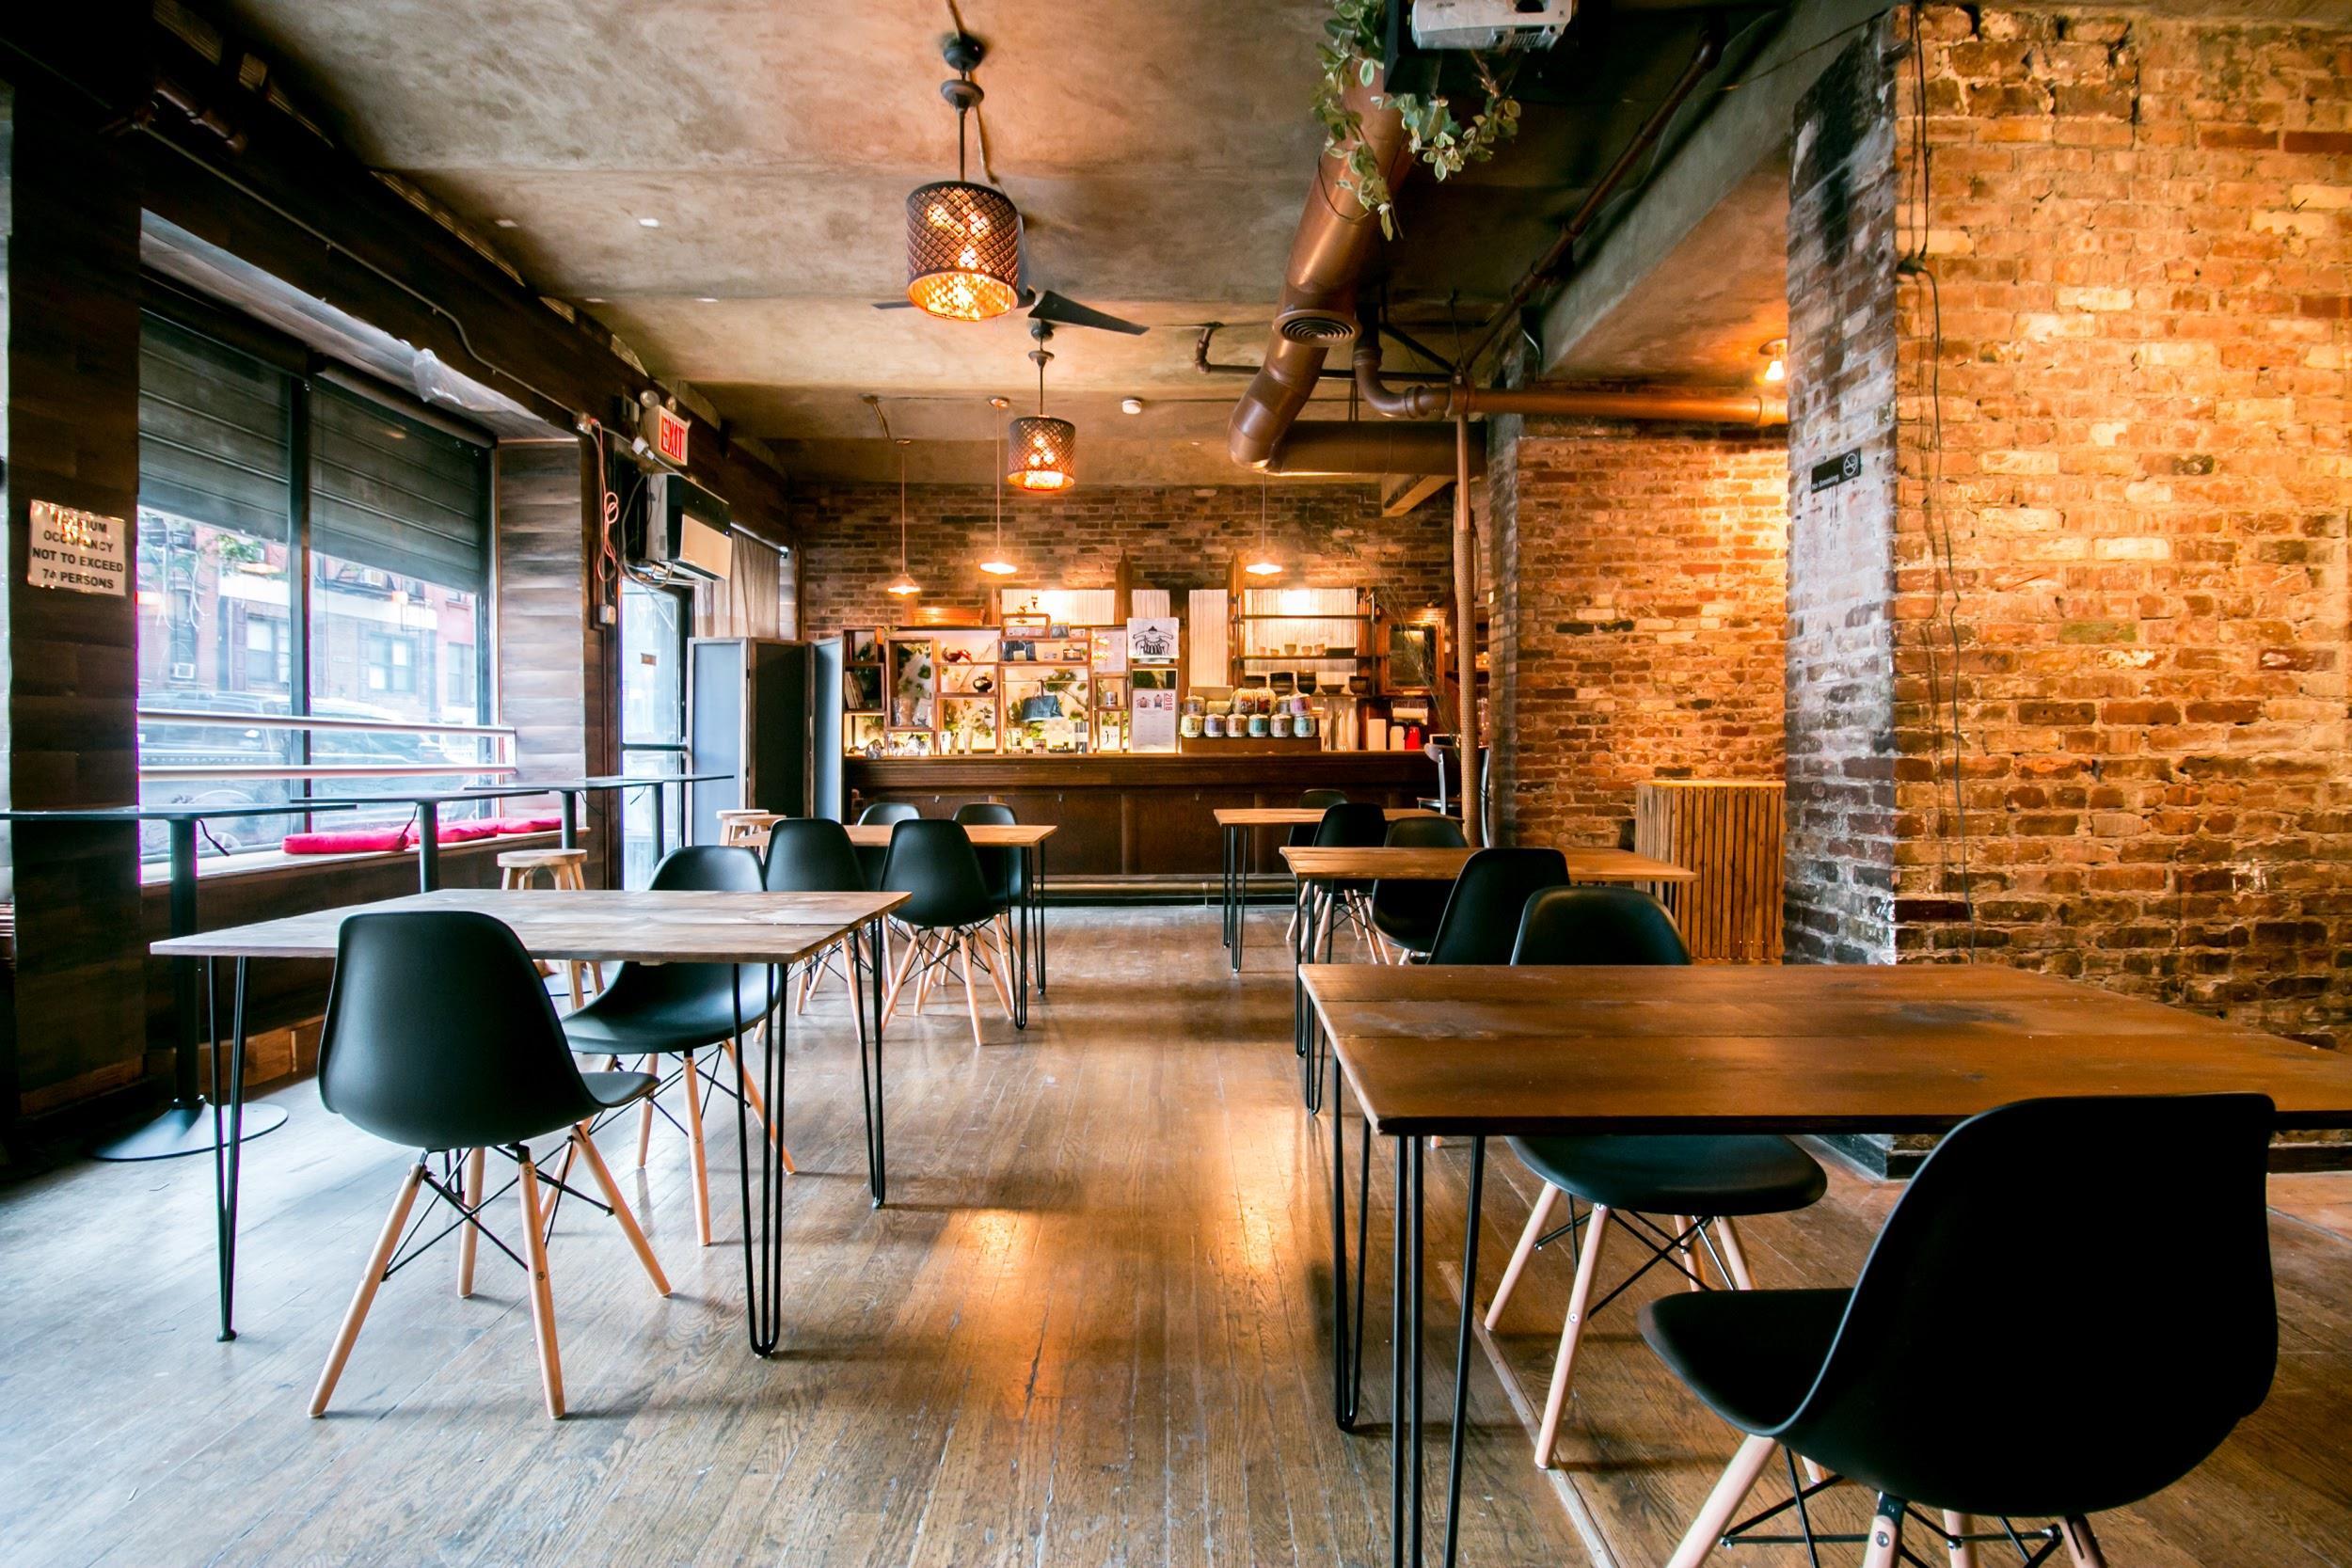 RESOBOX - Exposed brick co-working space